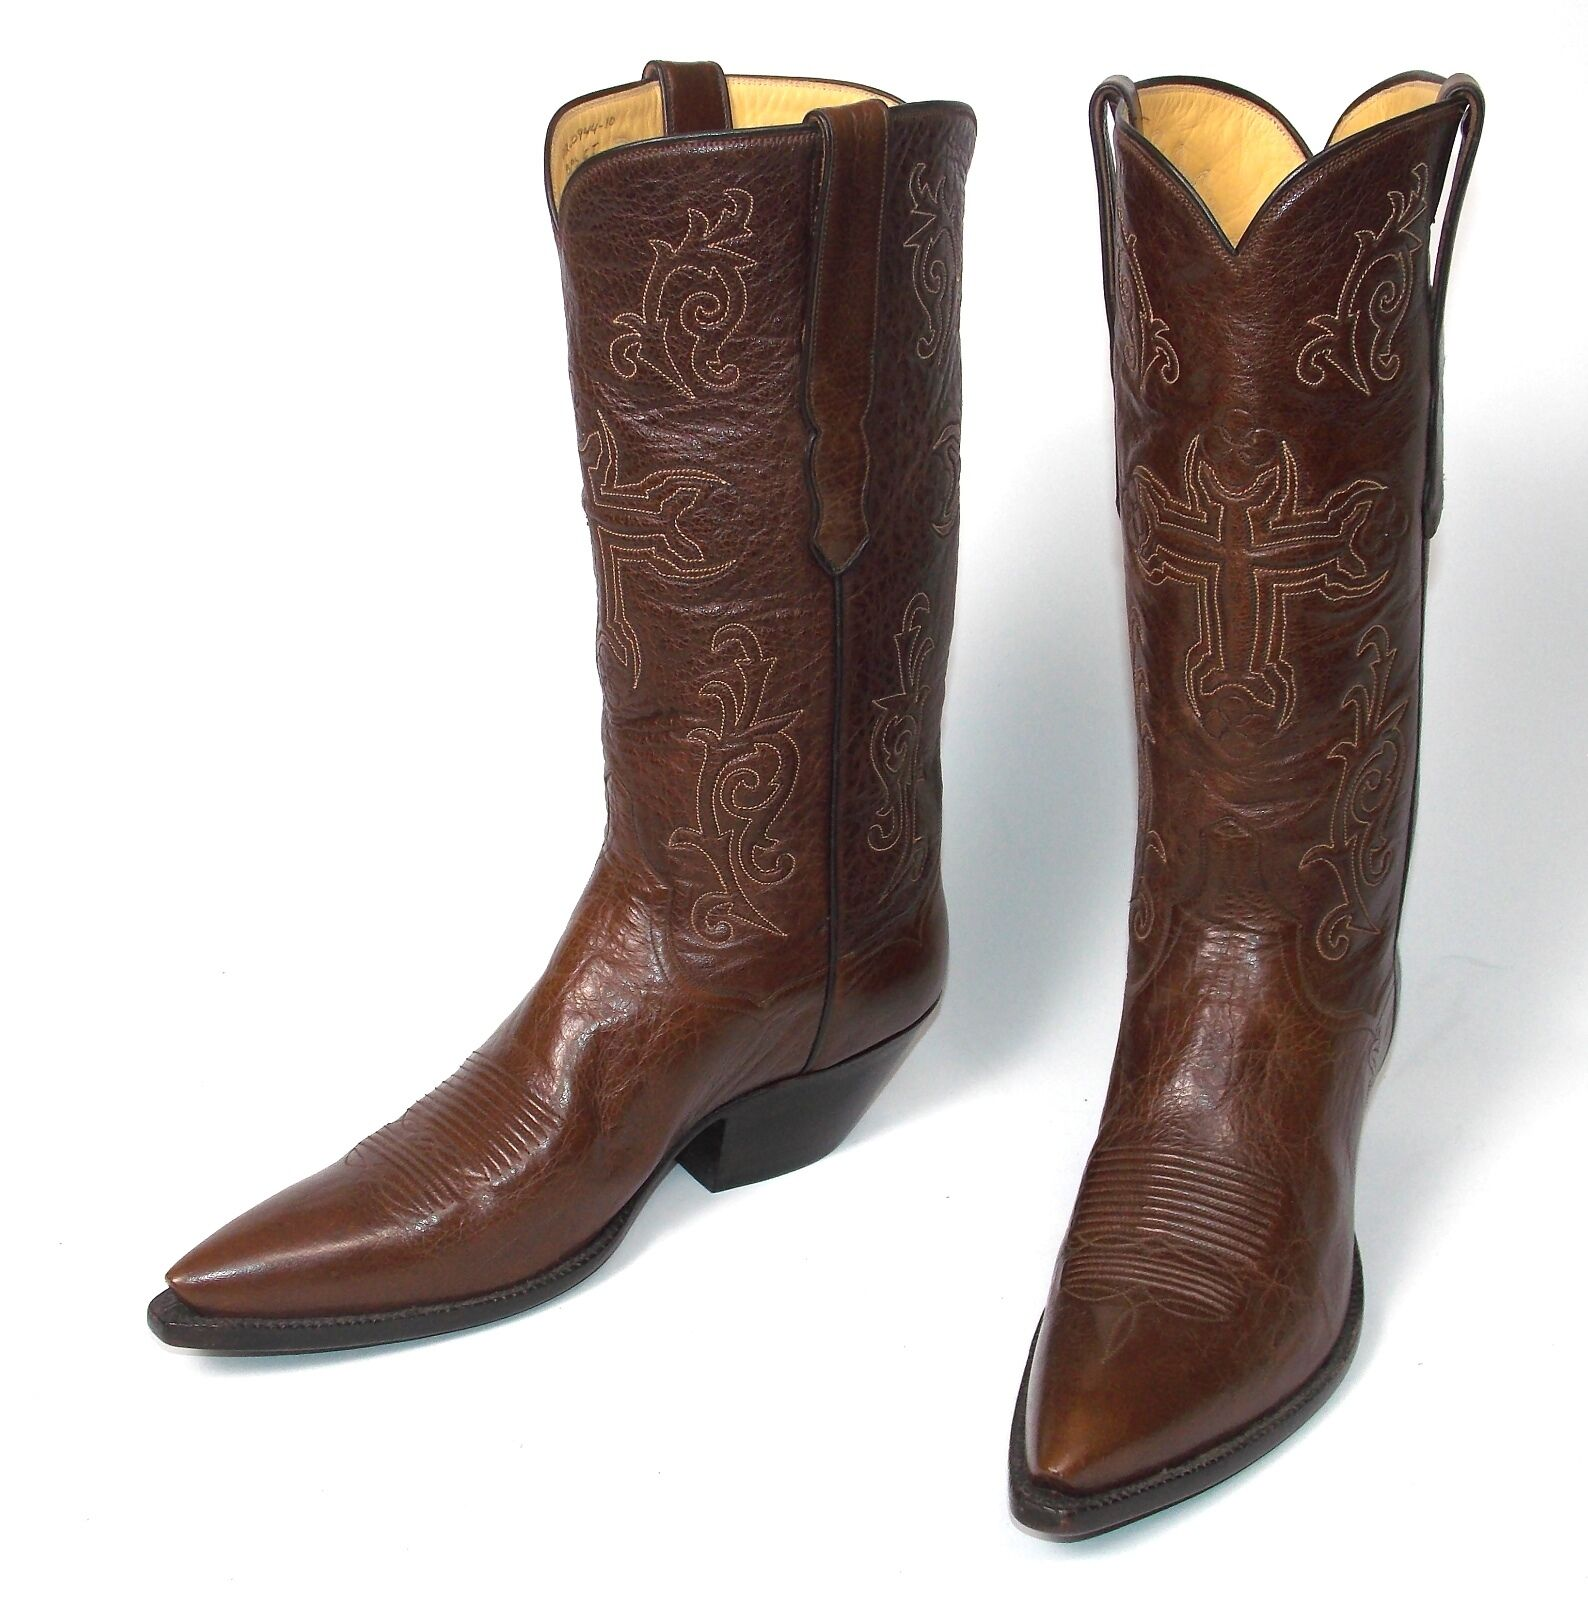 sport caldi Sexy T. O. Stanley Stanley Stanley Custom Marrone Cowboy stivali - Wms Dimensione 9.5B New w o Box  disegni esclusivi